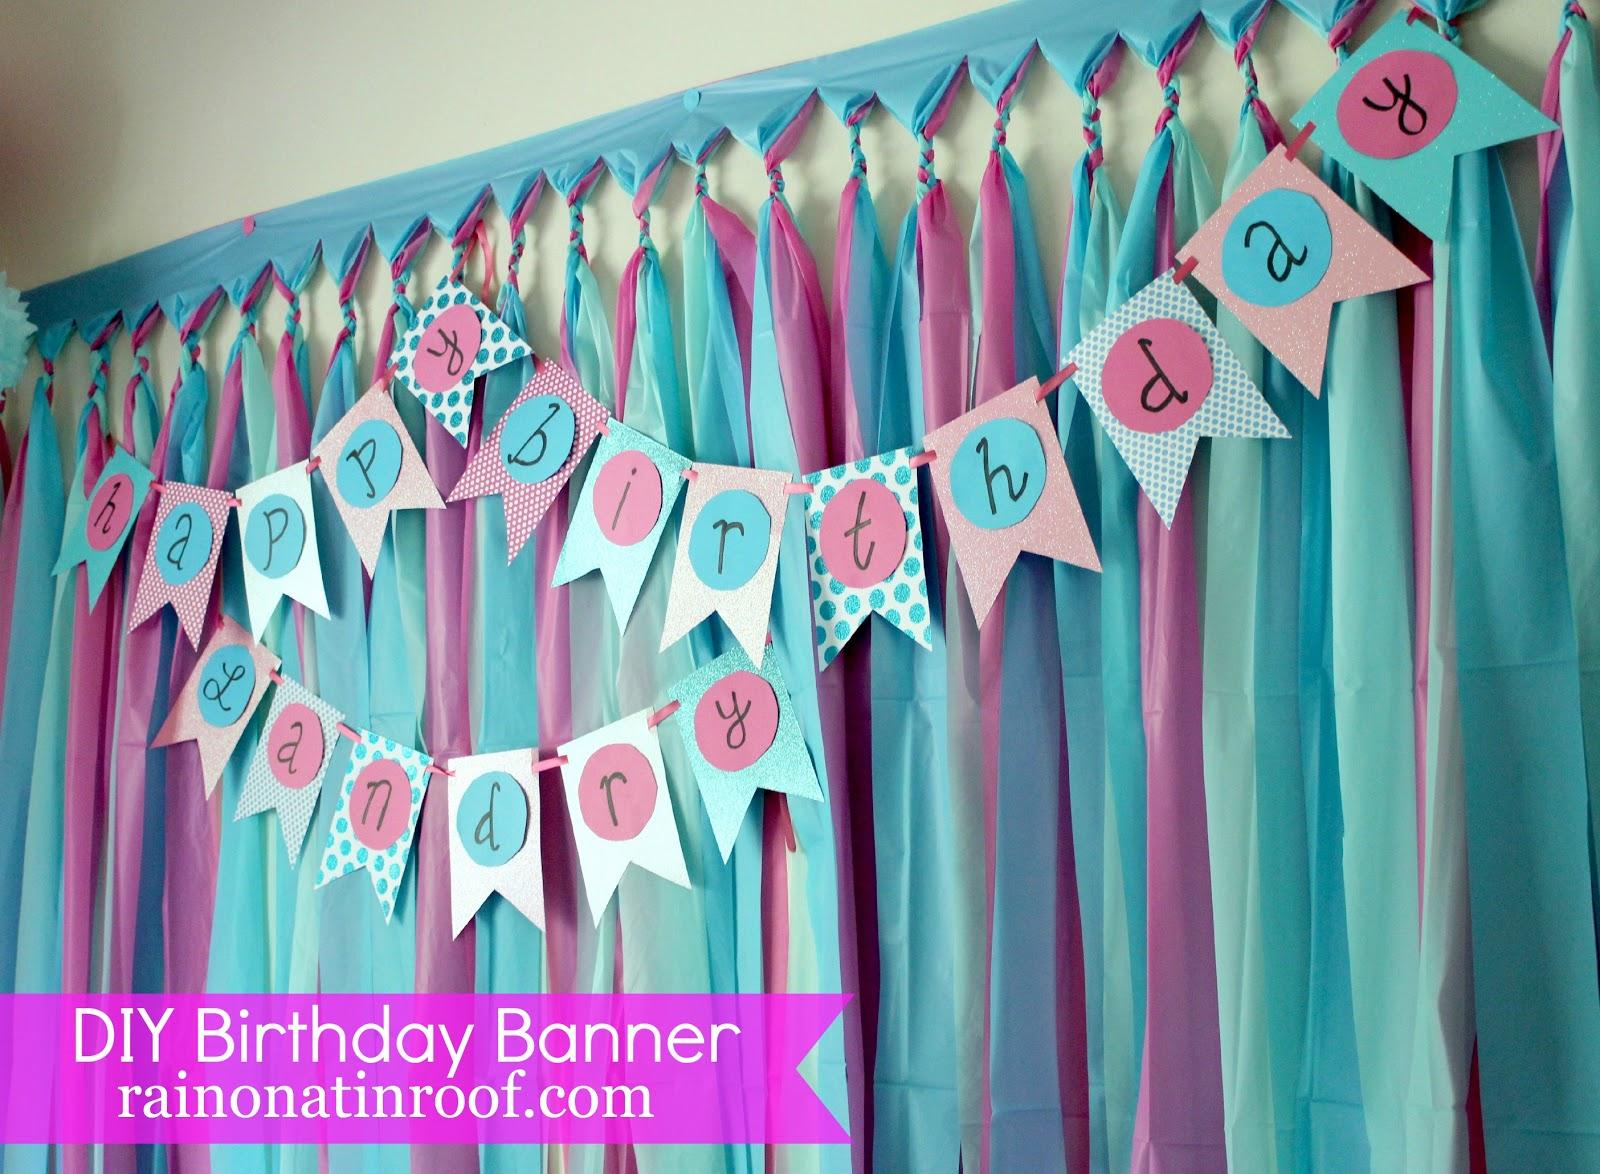 Easiest Ever Diy Birthday Banner Part 2